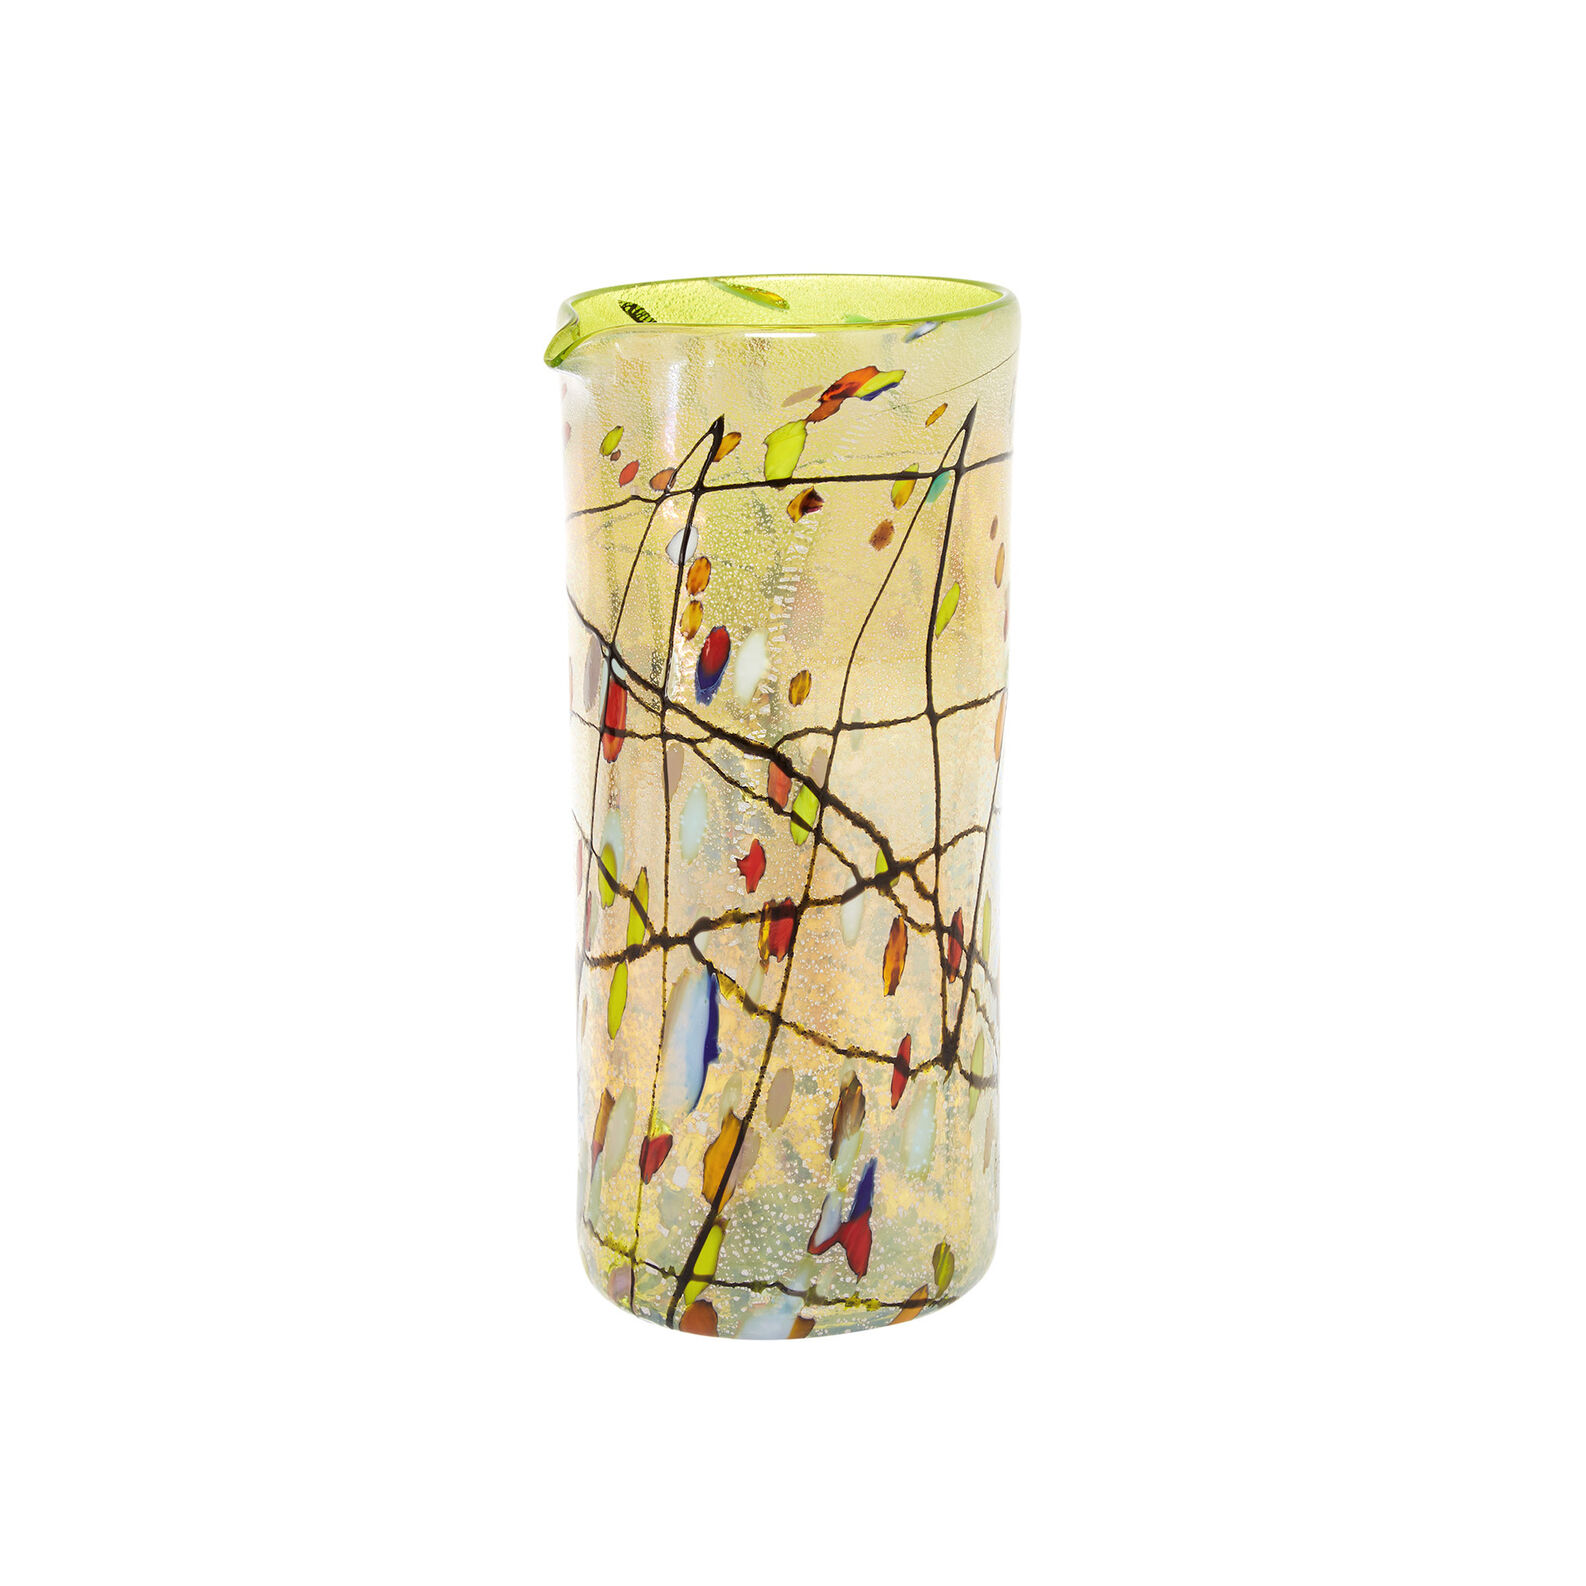 Murano glass carafe with Kandinsky decoration